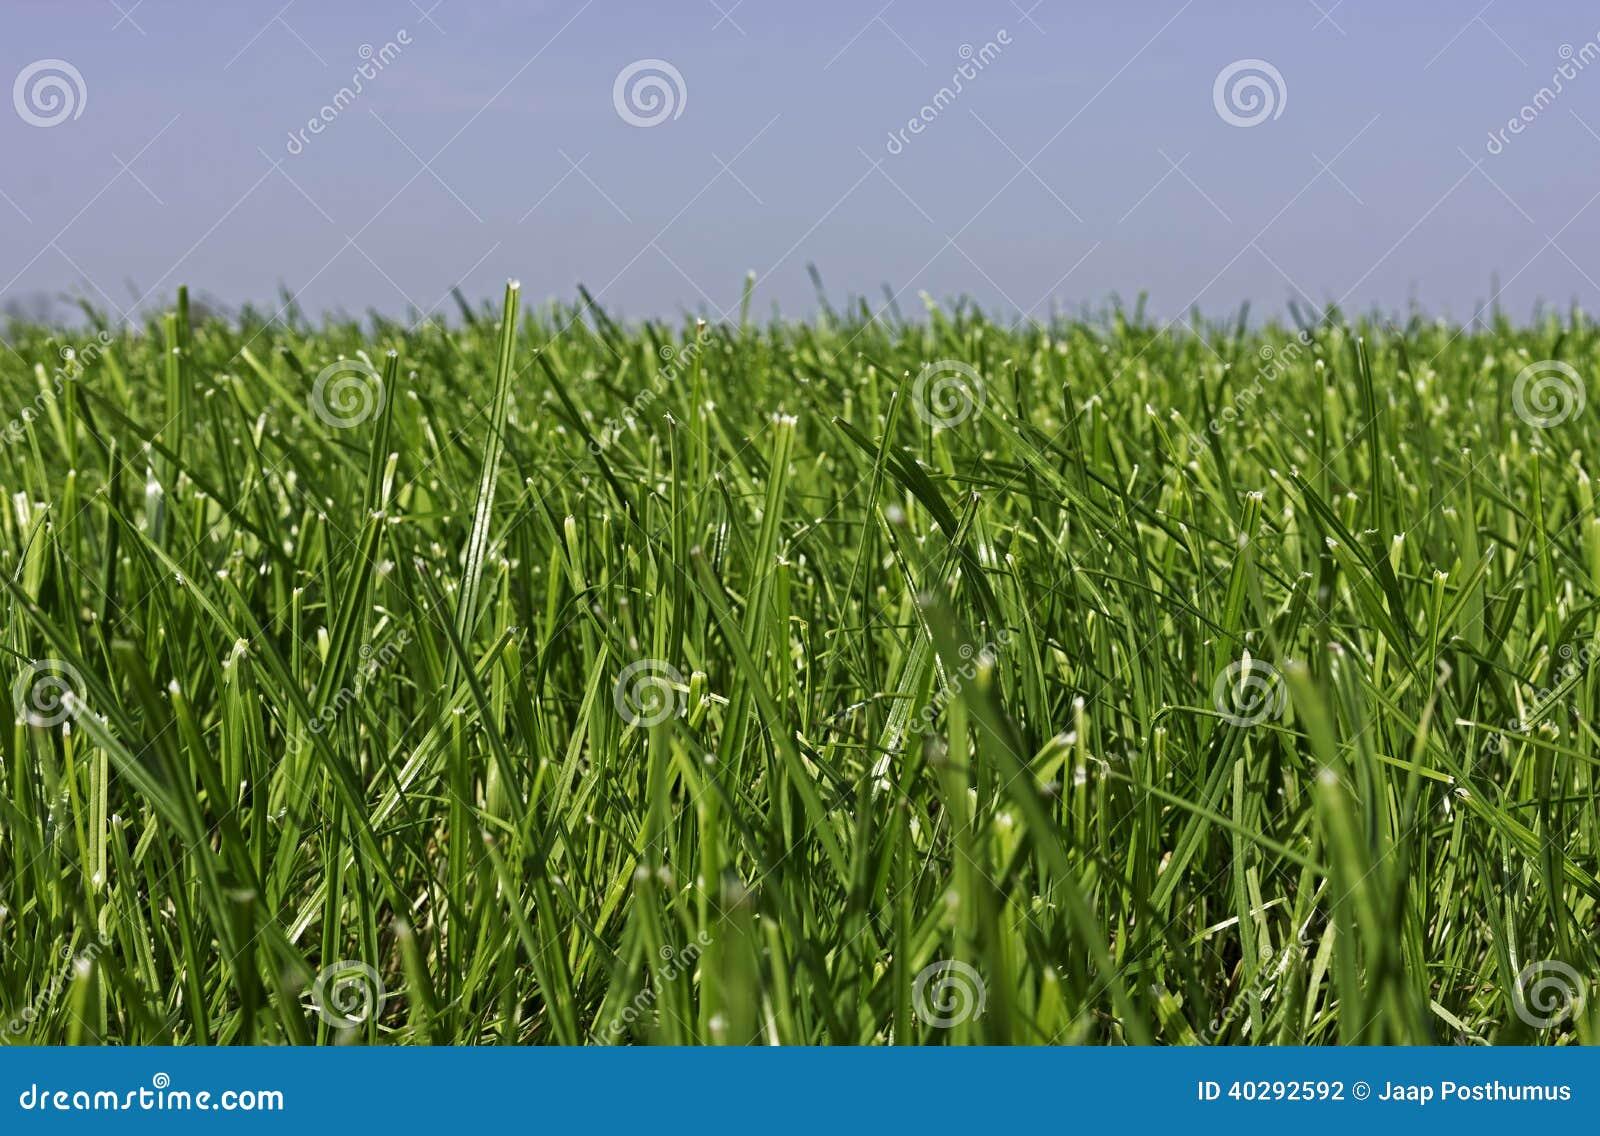 Луг при молодая трава растя для второго отрезка